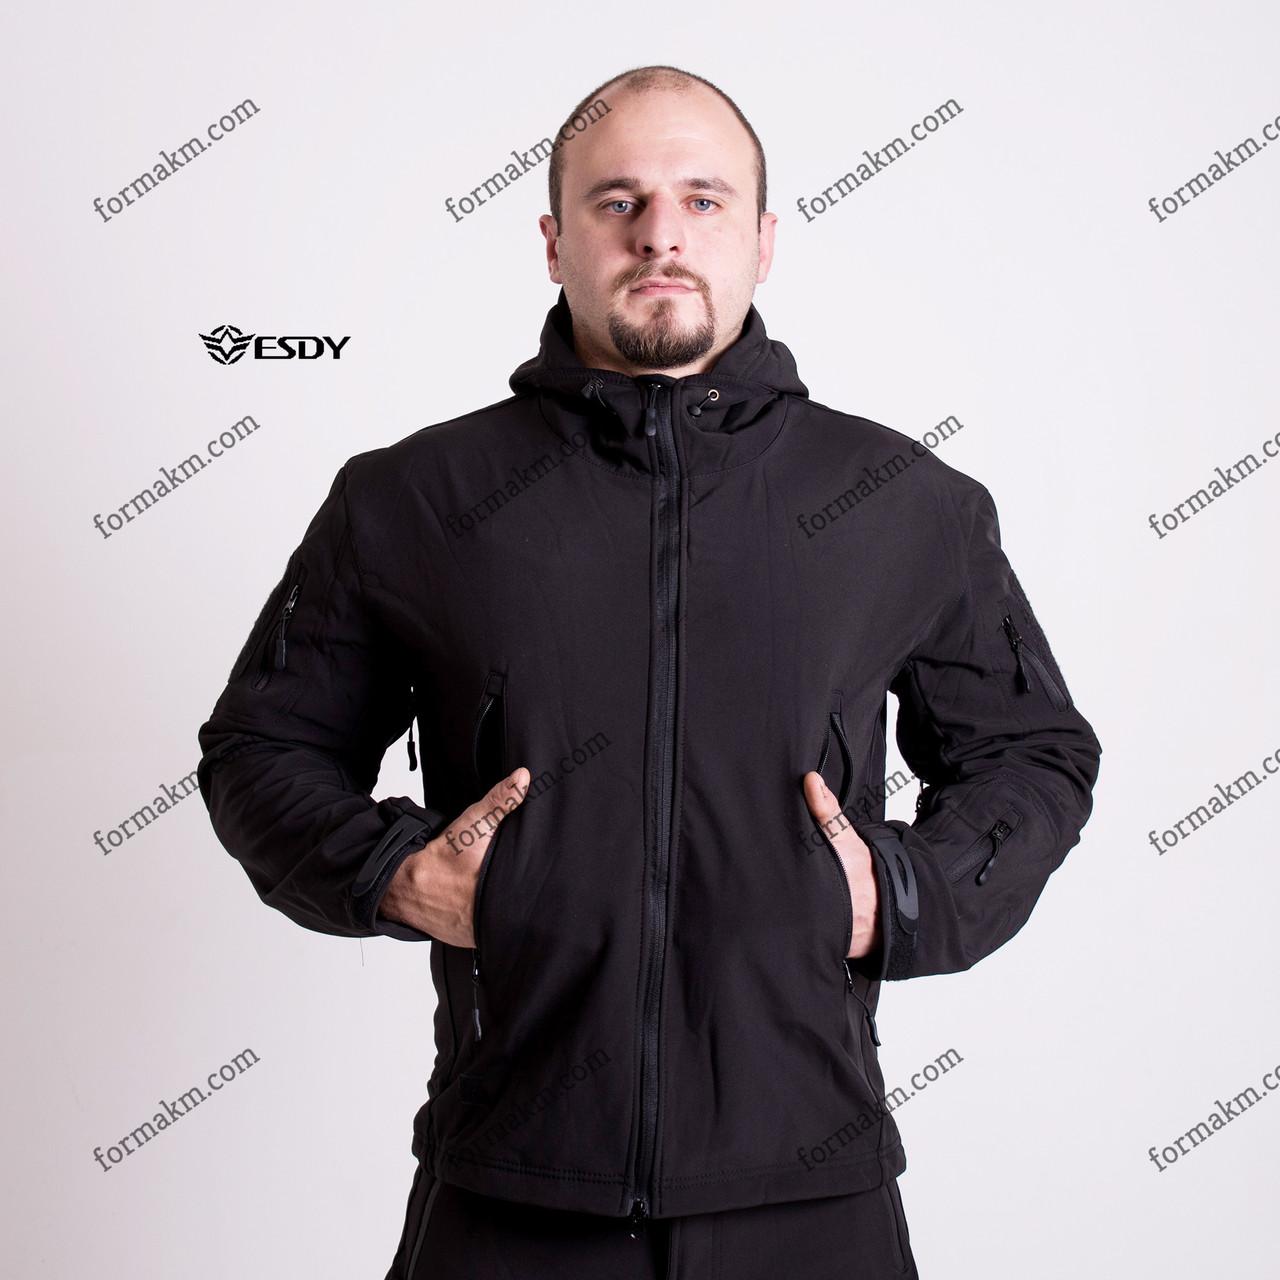 Тактическая куртка на флисе ESDY SoftShell Ranger Black